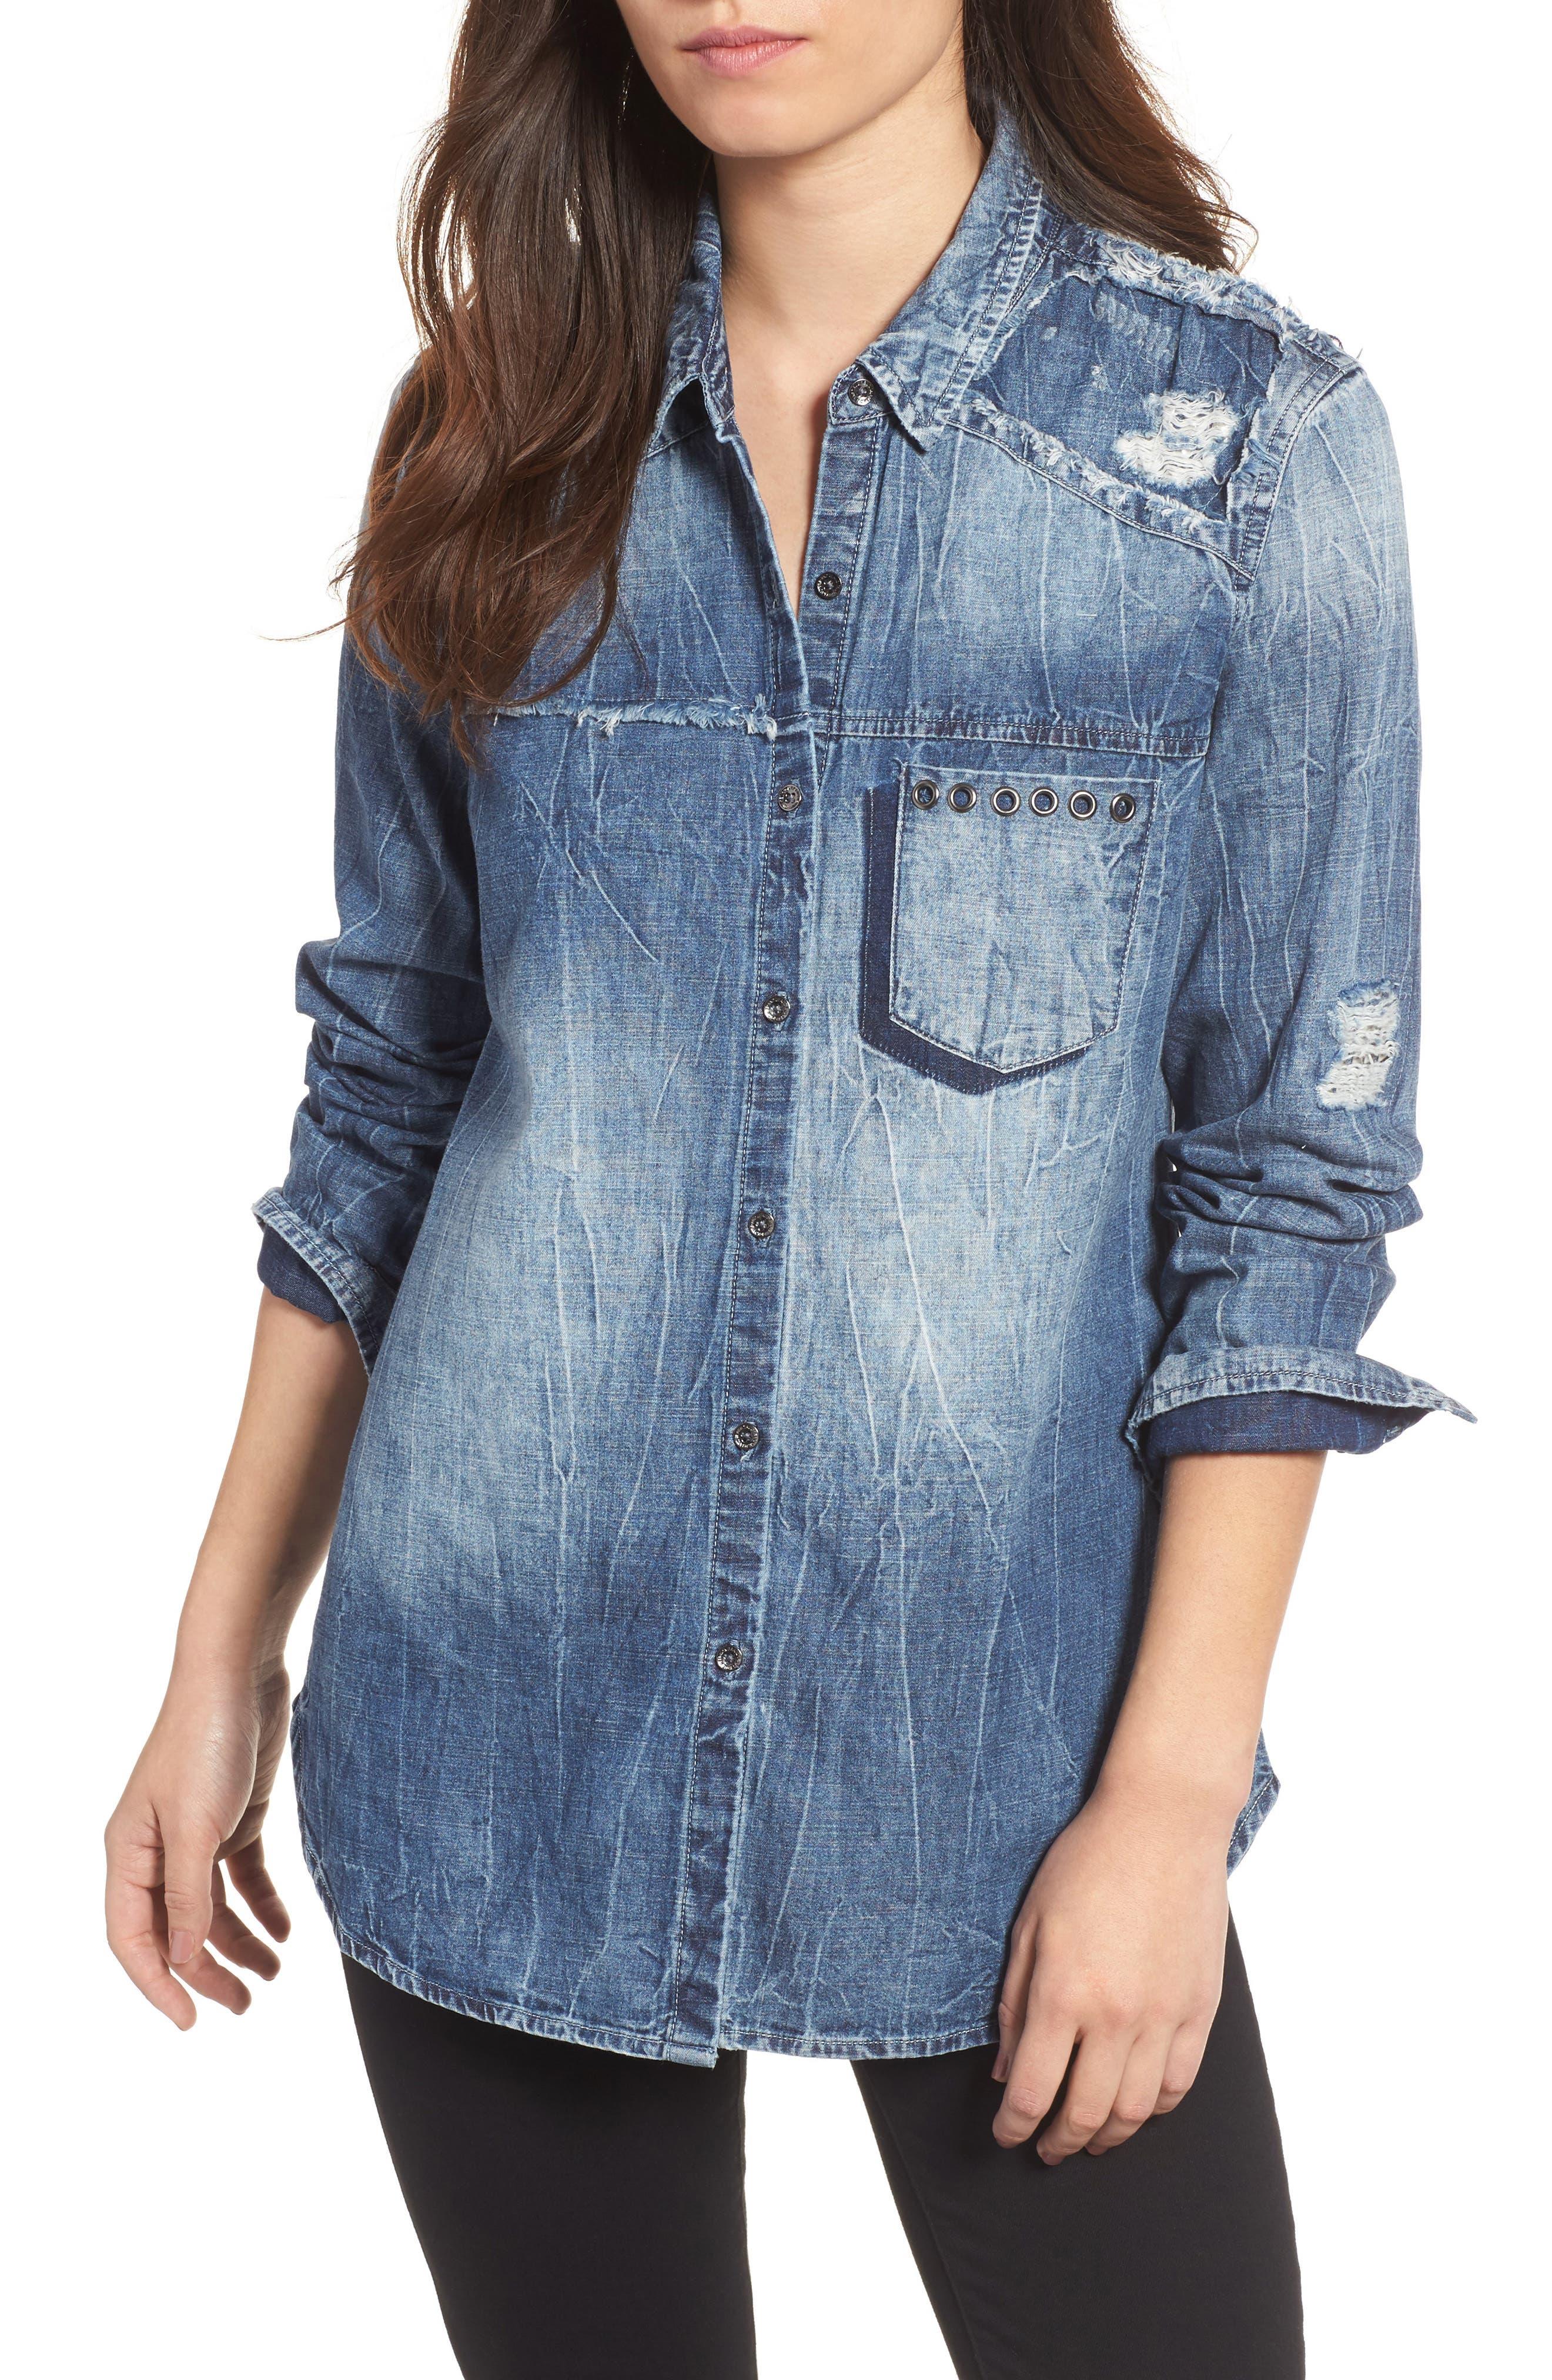 Main Image - True Religion Brand Jeans Georgia Distressed Denim Shirt